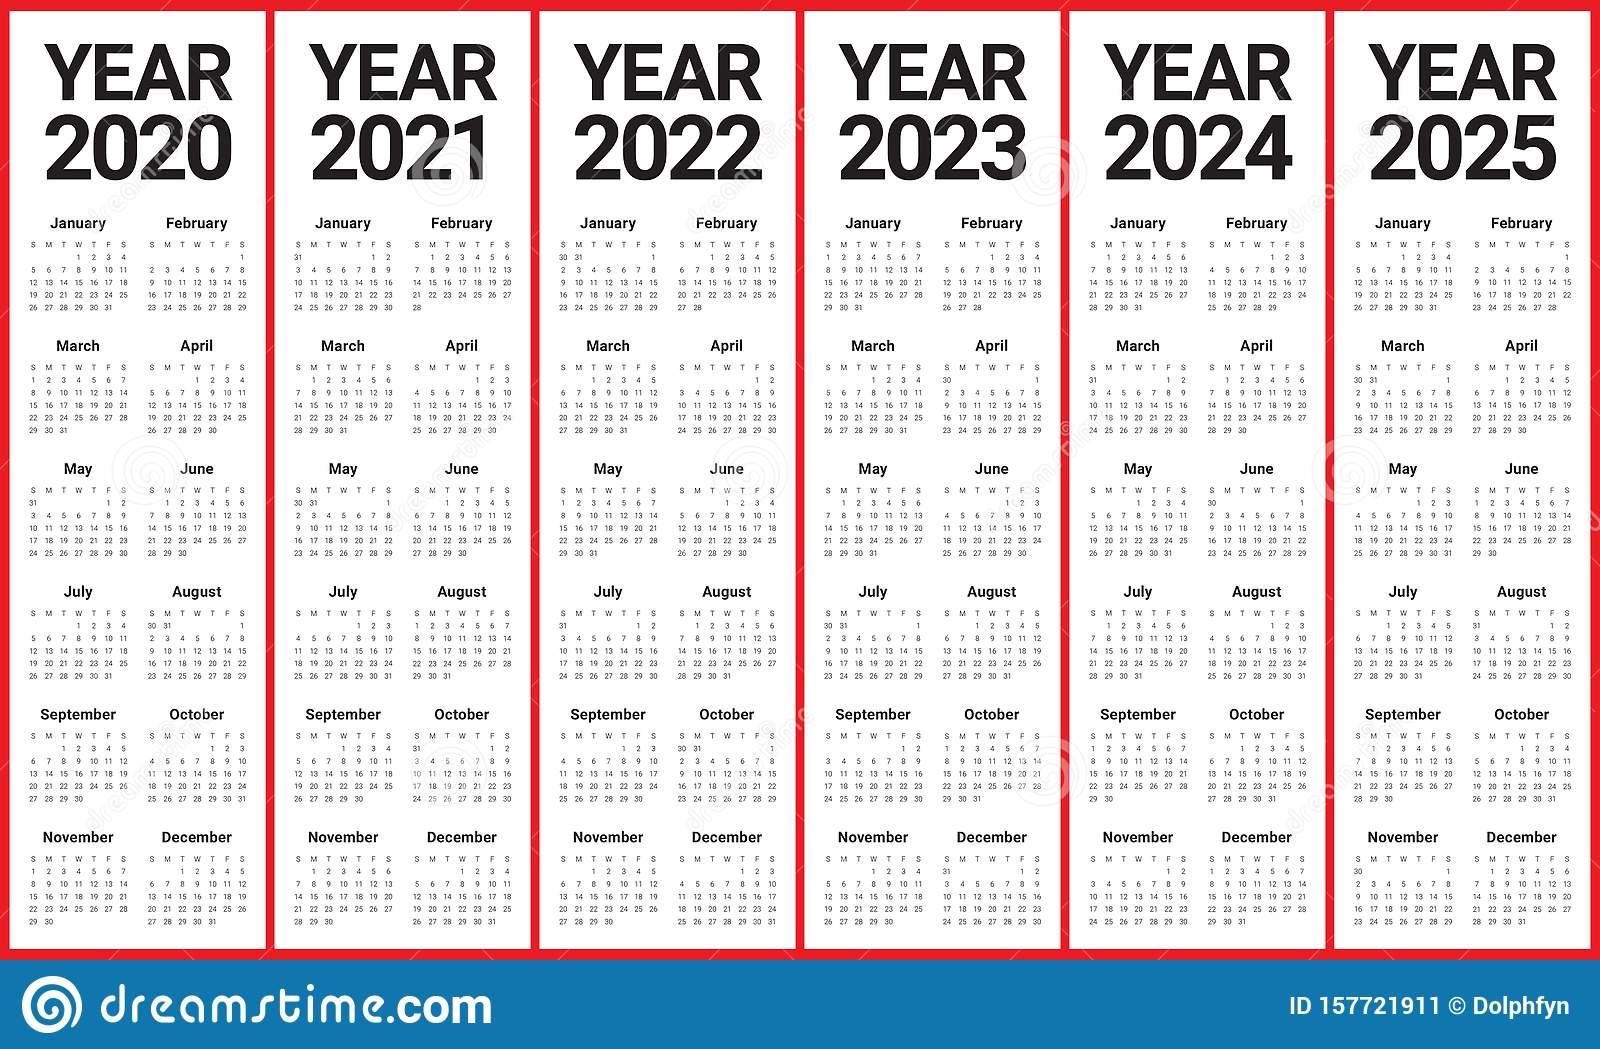 Year 2020 2021 2022 2023 2024 2025 Calendar Vector Design pertaining to 3 Year Calendar 2020 To 2023